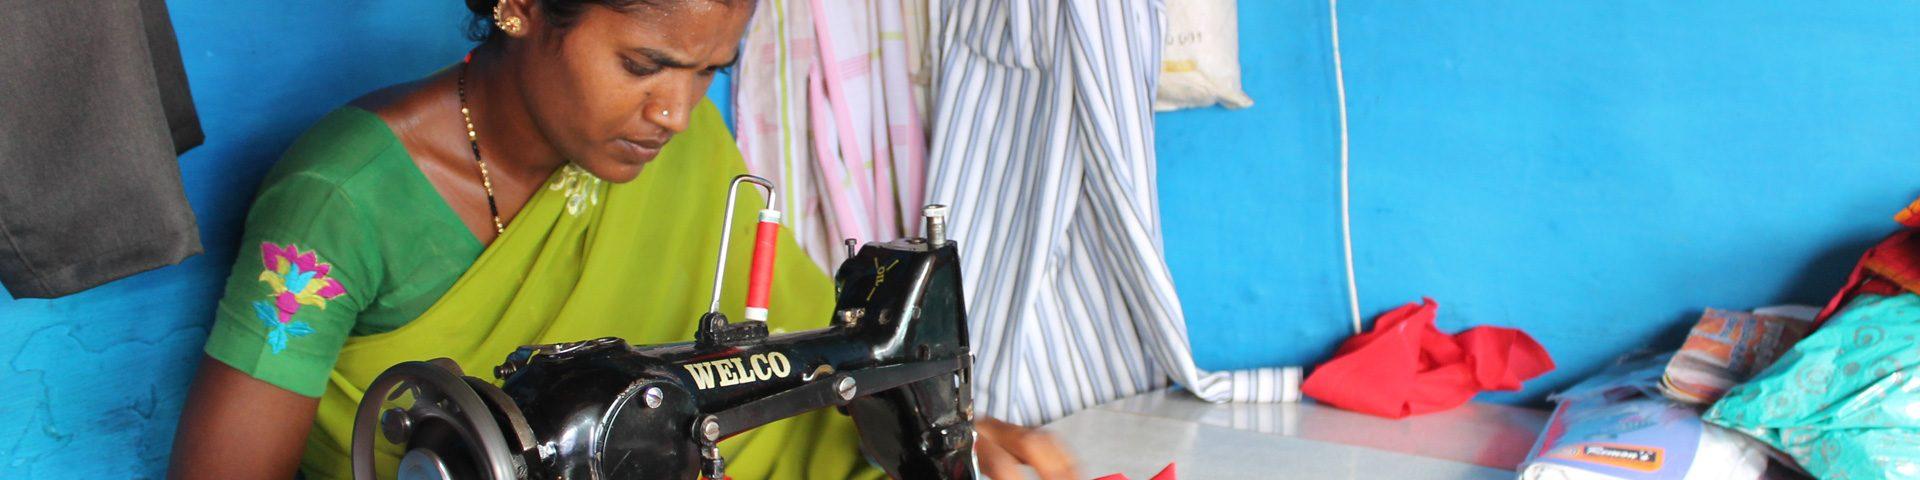 Indiase vrouw achter naaimachine.